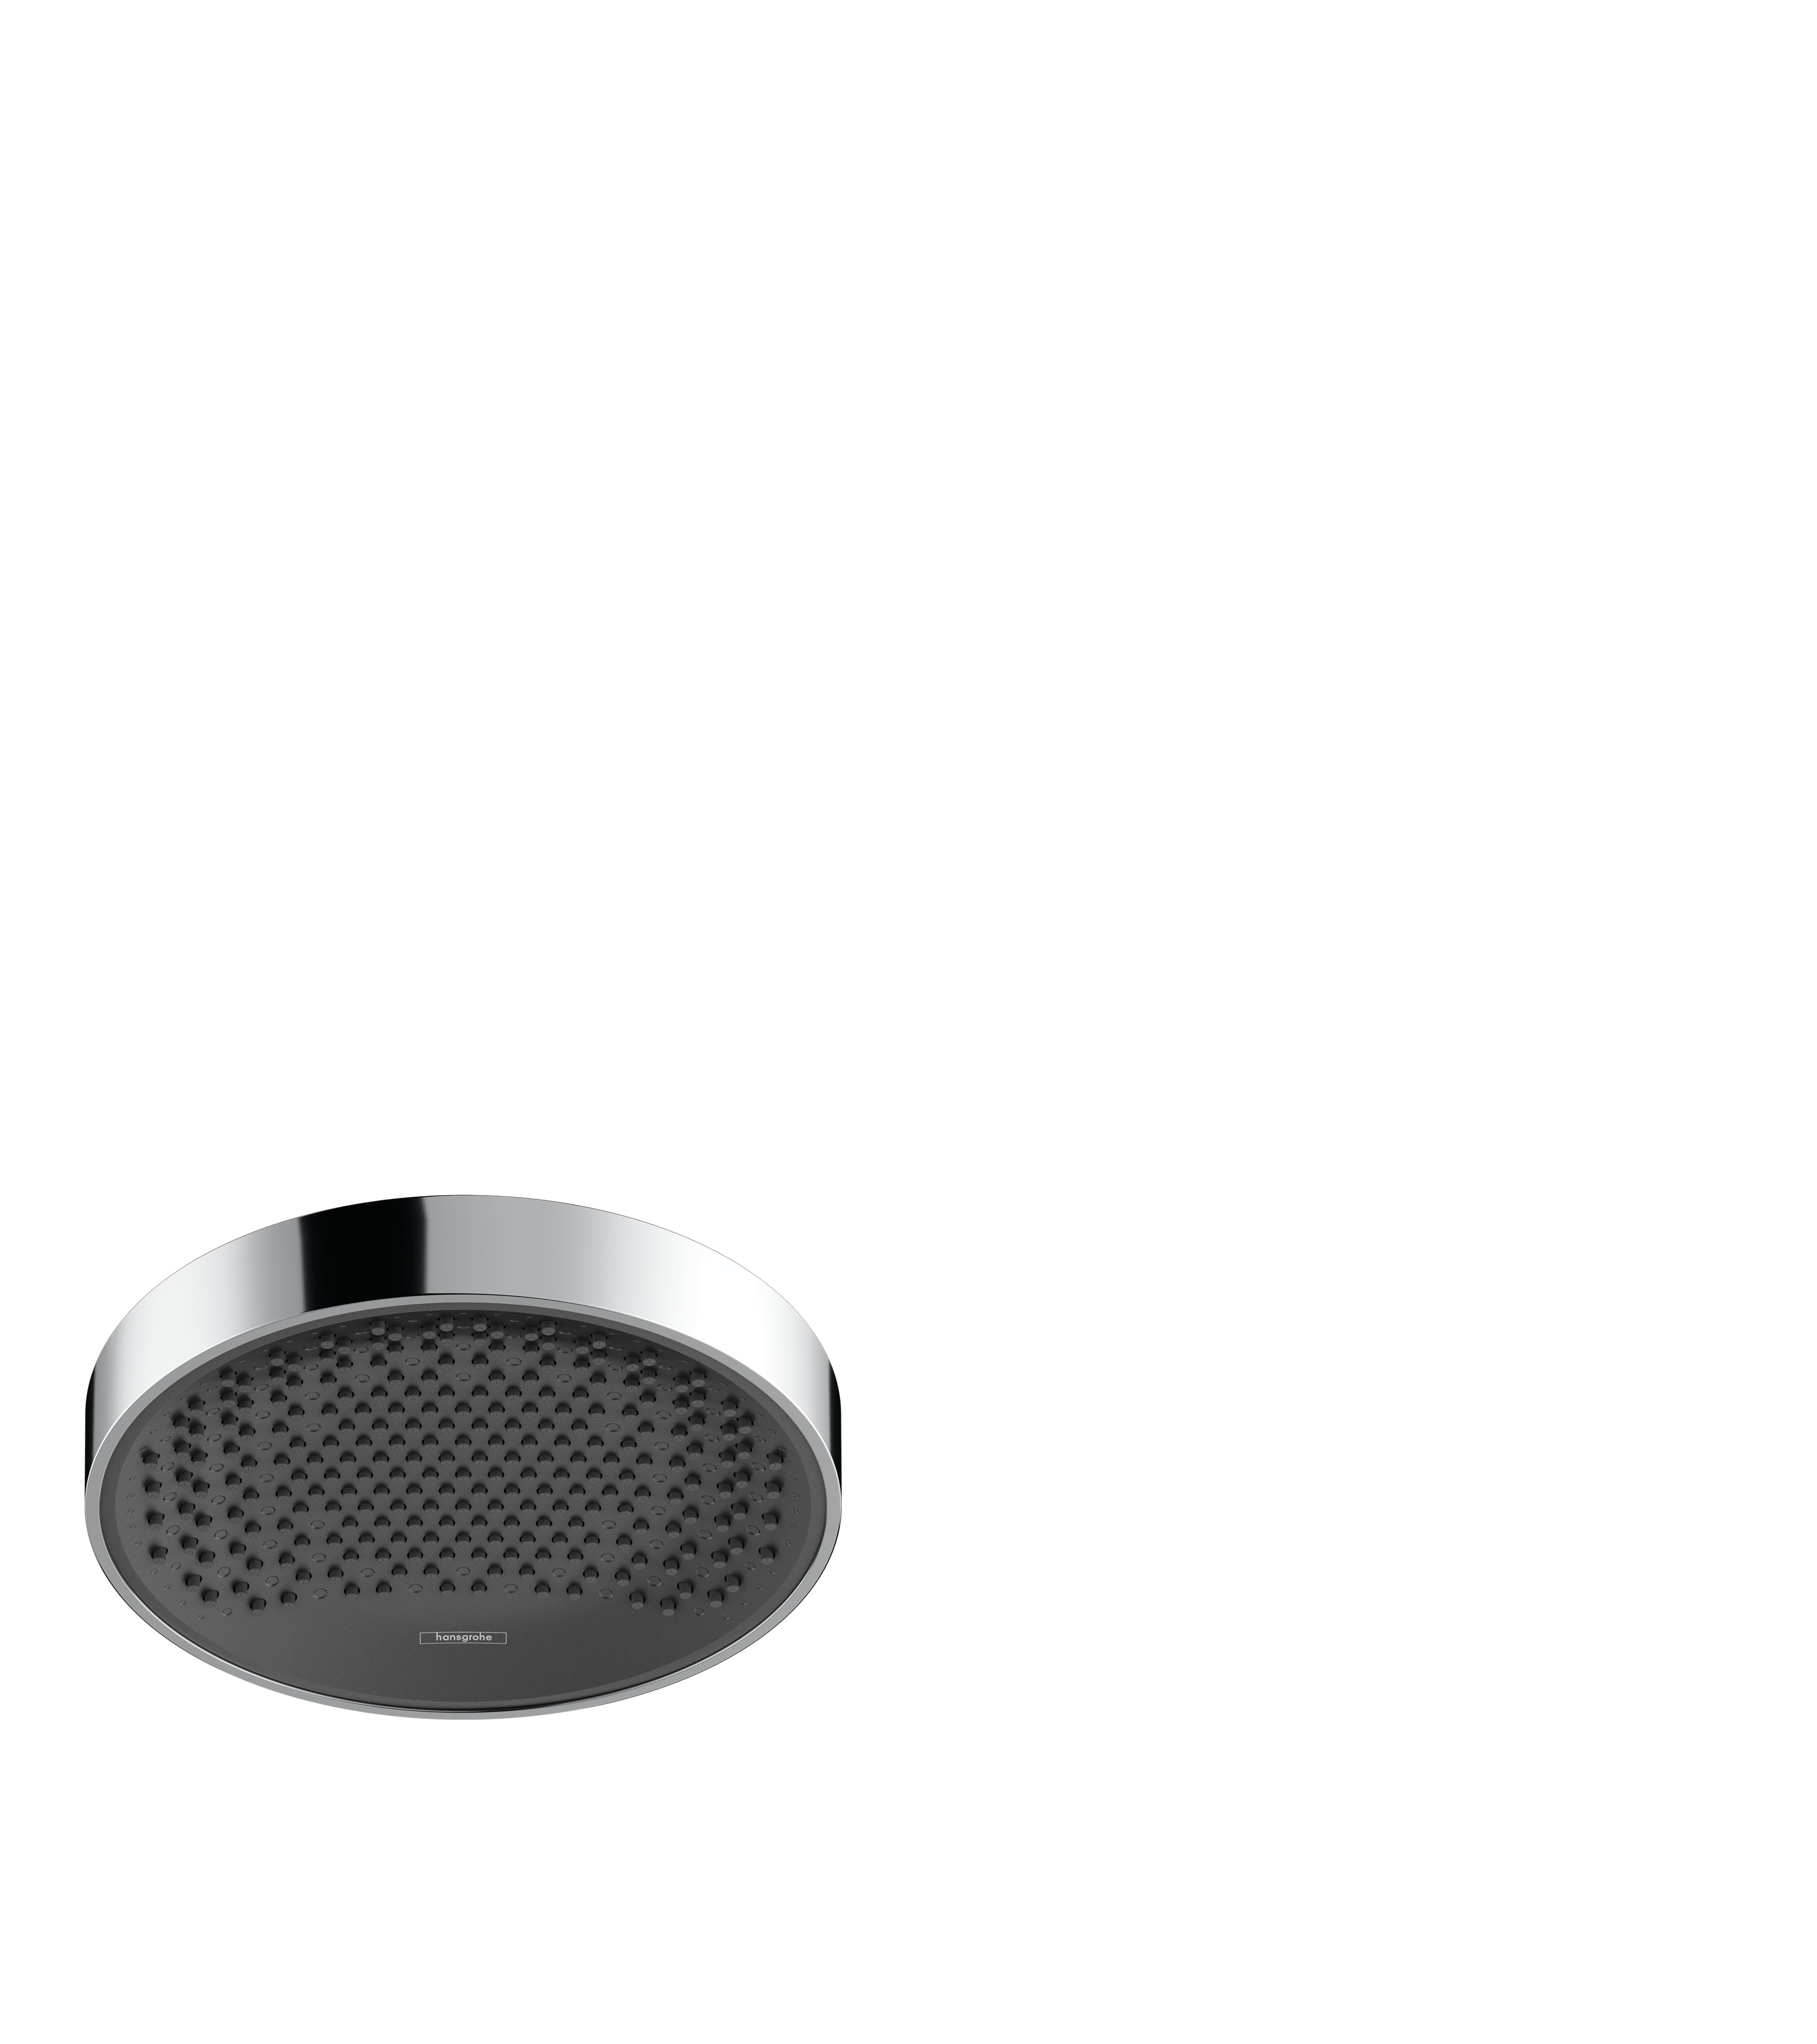 Верхний душ hansgrohe Rainfinity 250 1jet EcoSmart 9 л/мин 26229000 верхний душ hansgrohe rainfinity 250 1jet 26228700